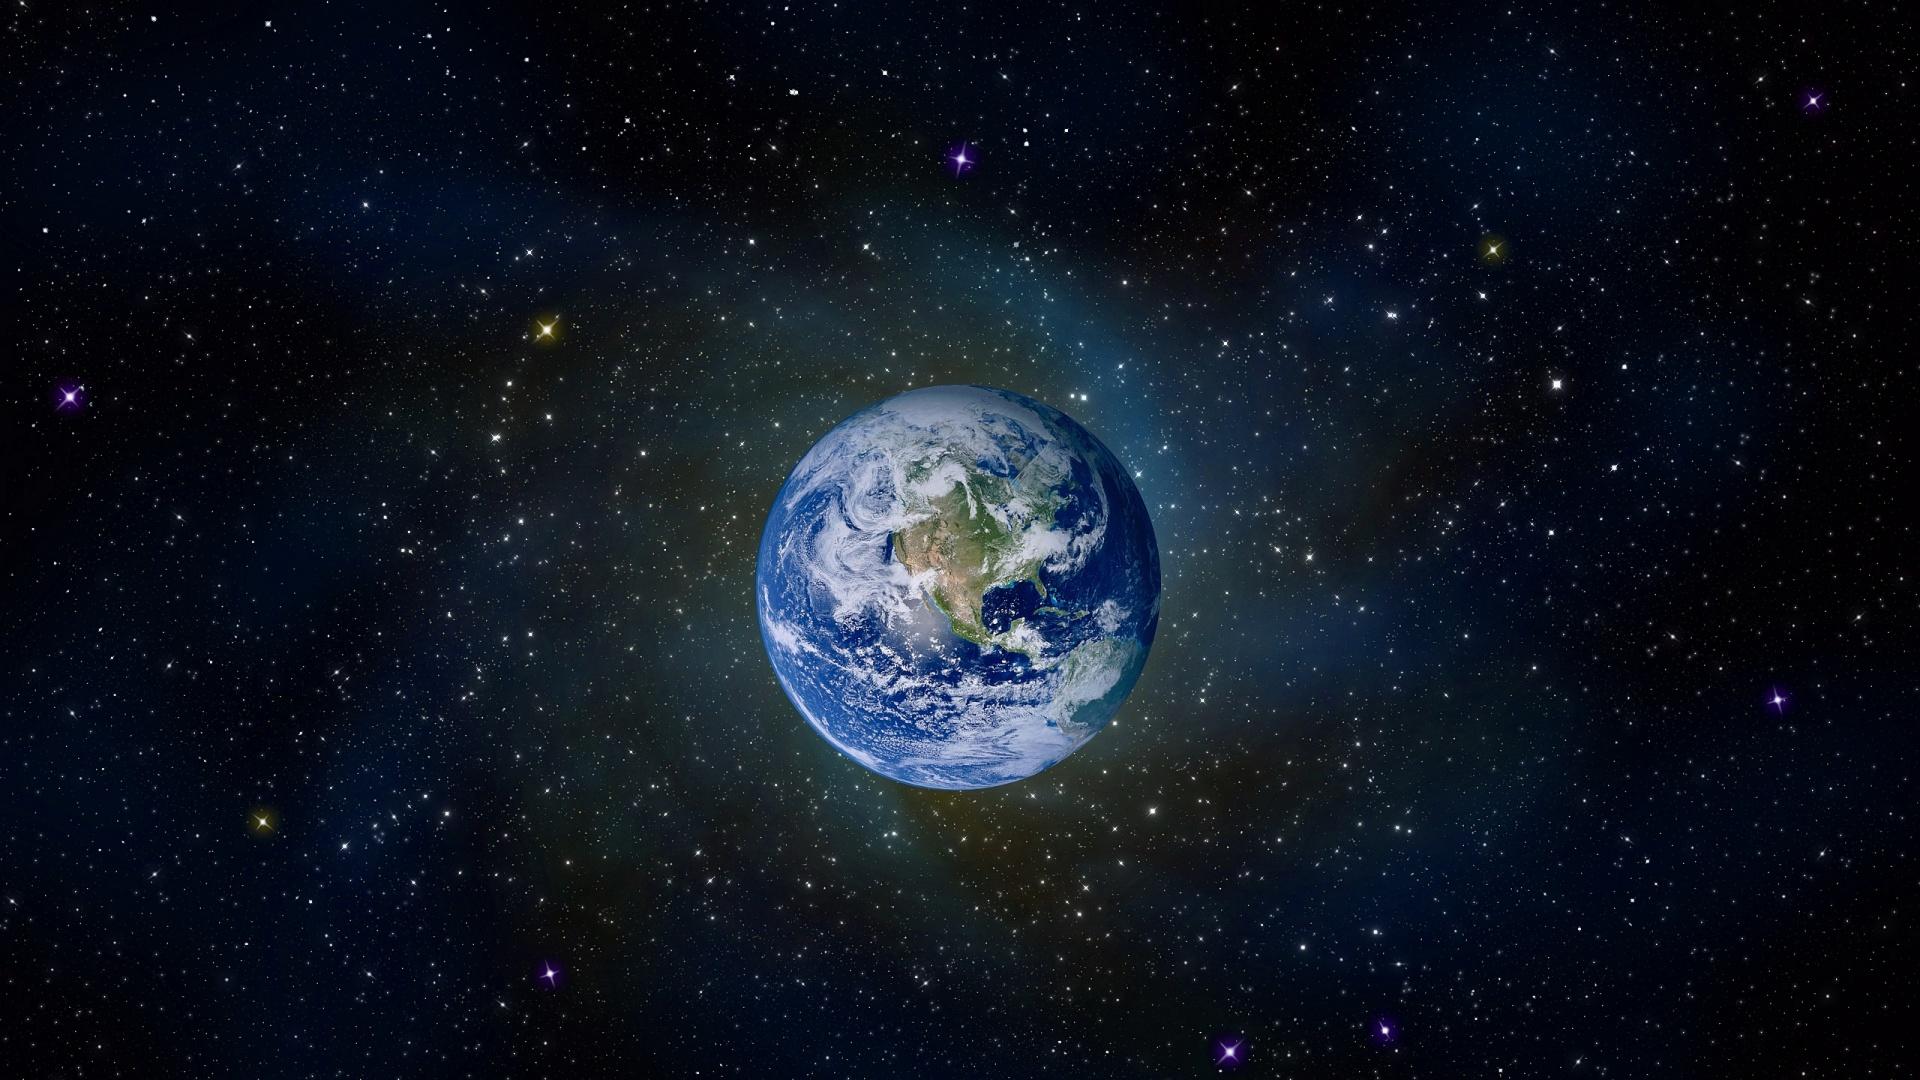 earth wallpaper hd 1080p - photo #12